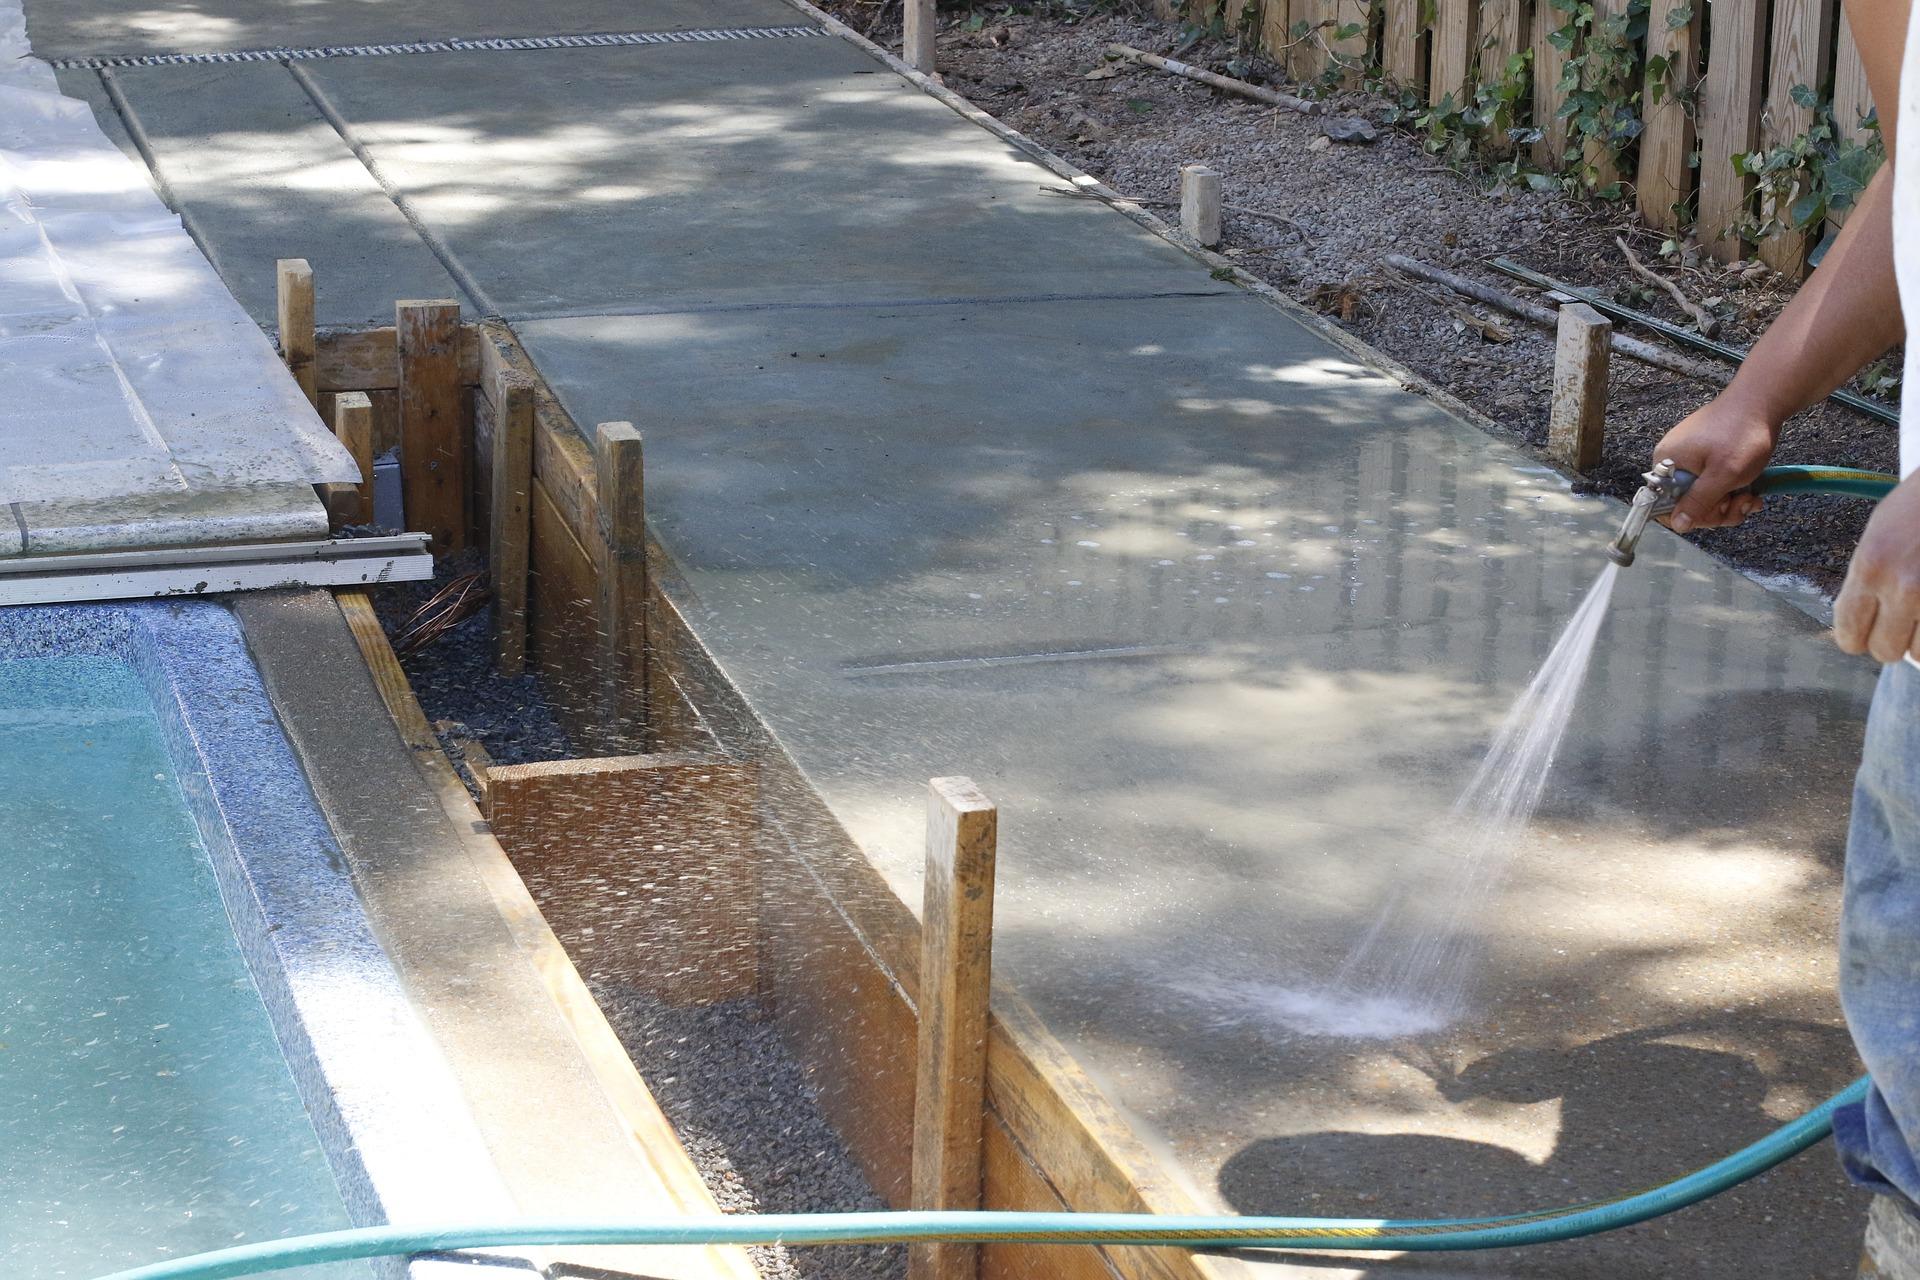 Houston concrete supply lays new concrete for sidewalk